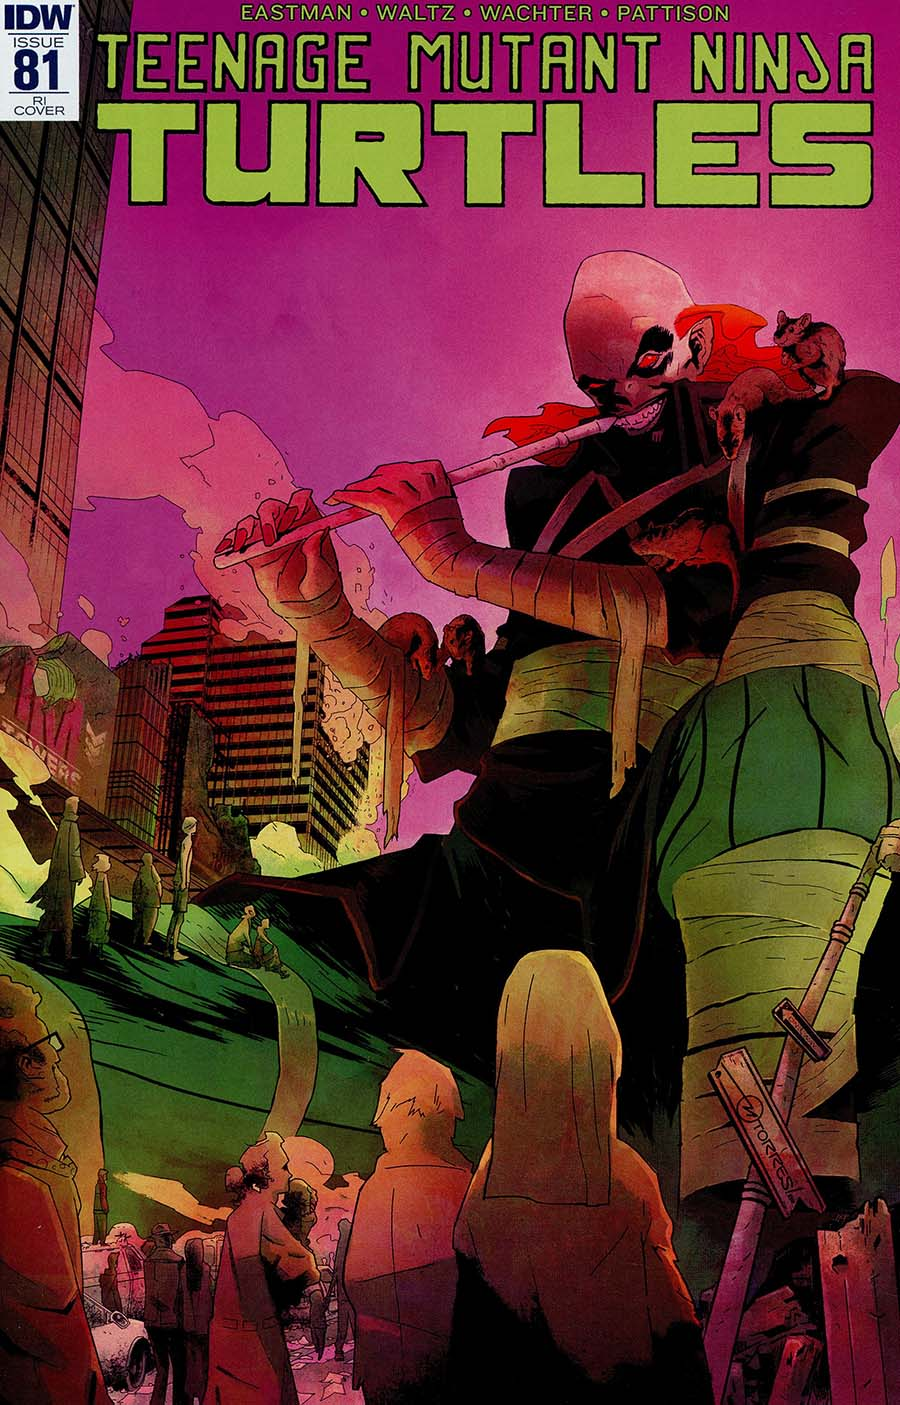 Teenage Mutant Ninja Turtles Vol 5 #81 Cover C Incentive Mark Torres Variant Cover